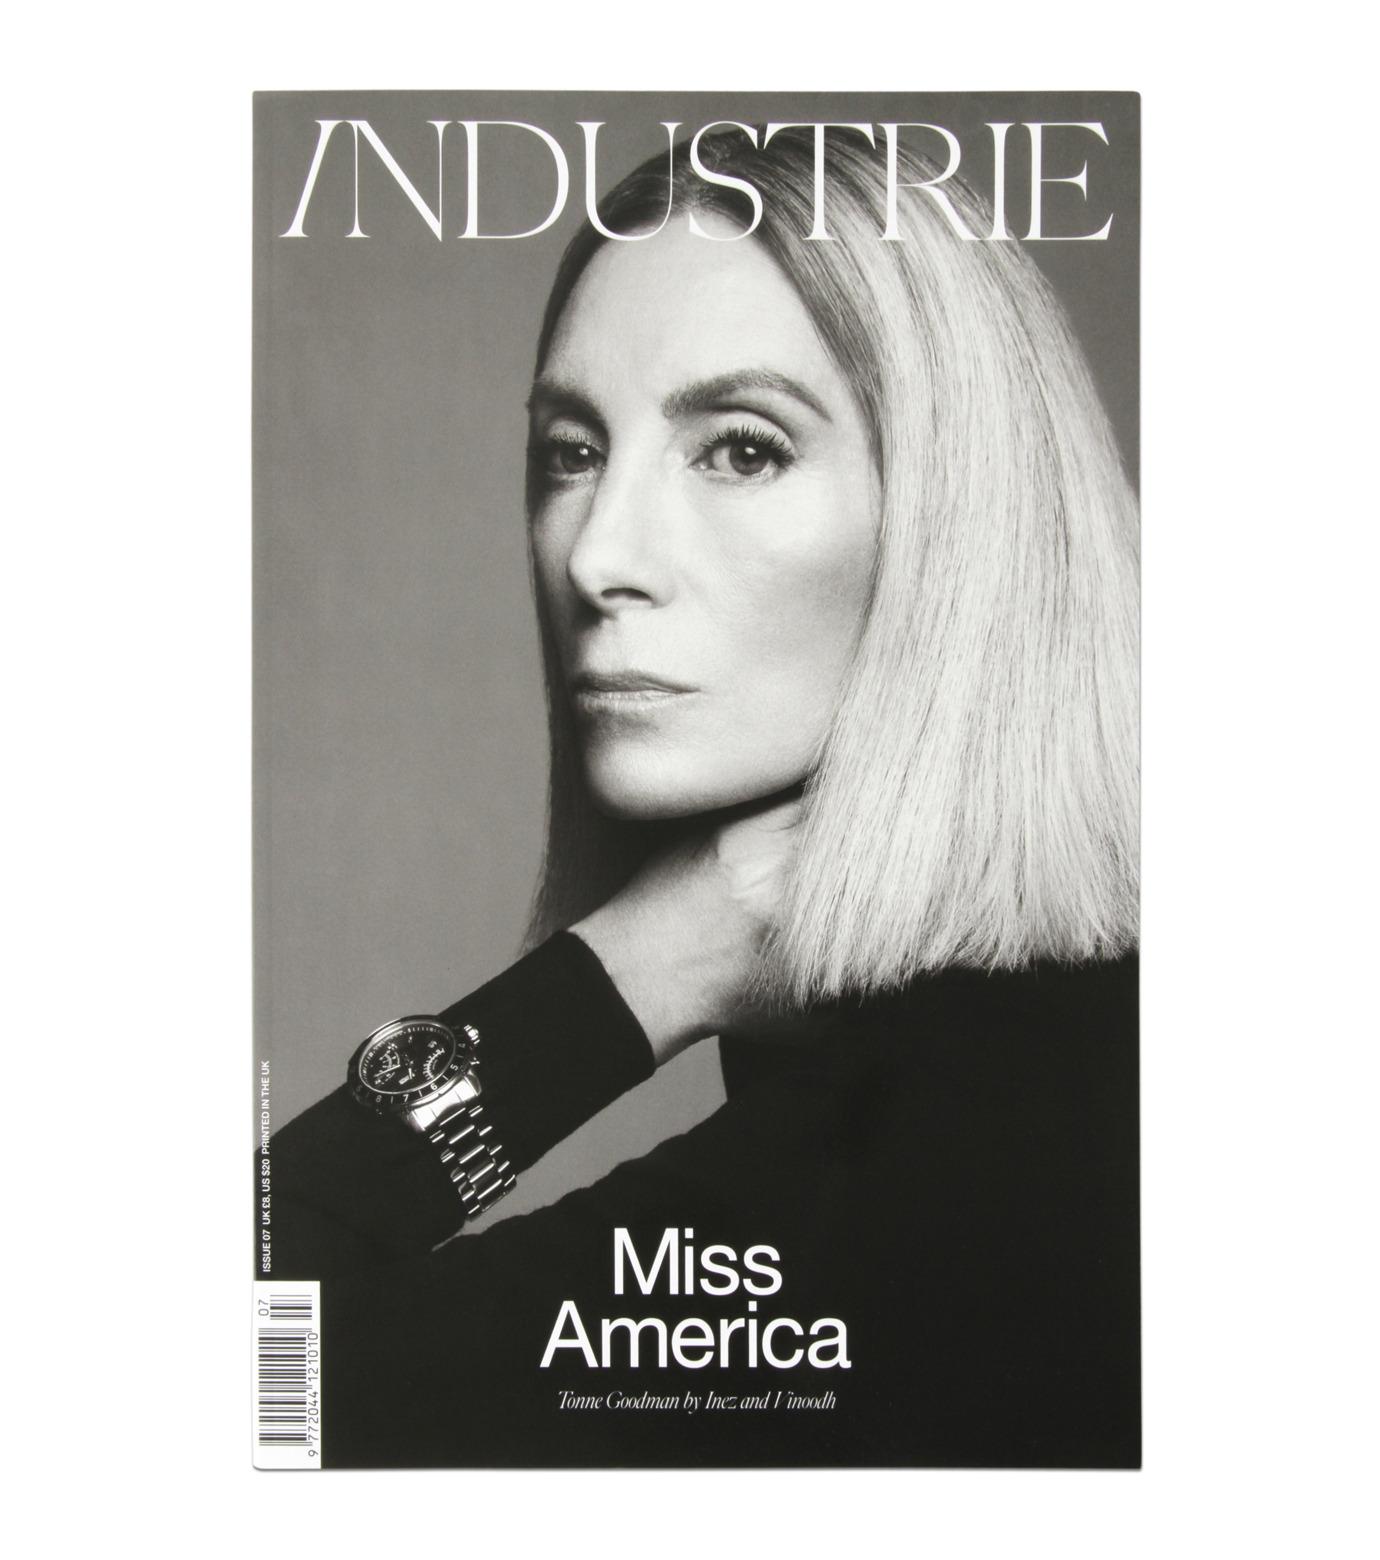 Magazine(マガジン)のINDUSTRIE (#7)-NONE-IN1520X14007-0 拡大詳細画像1